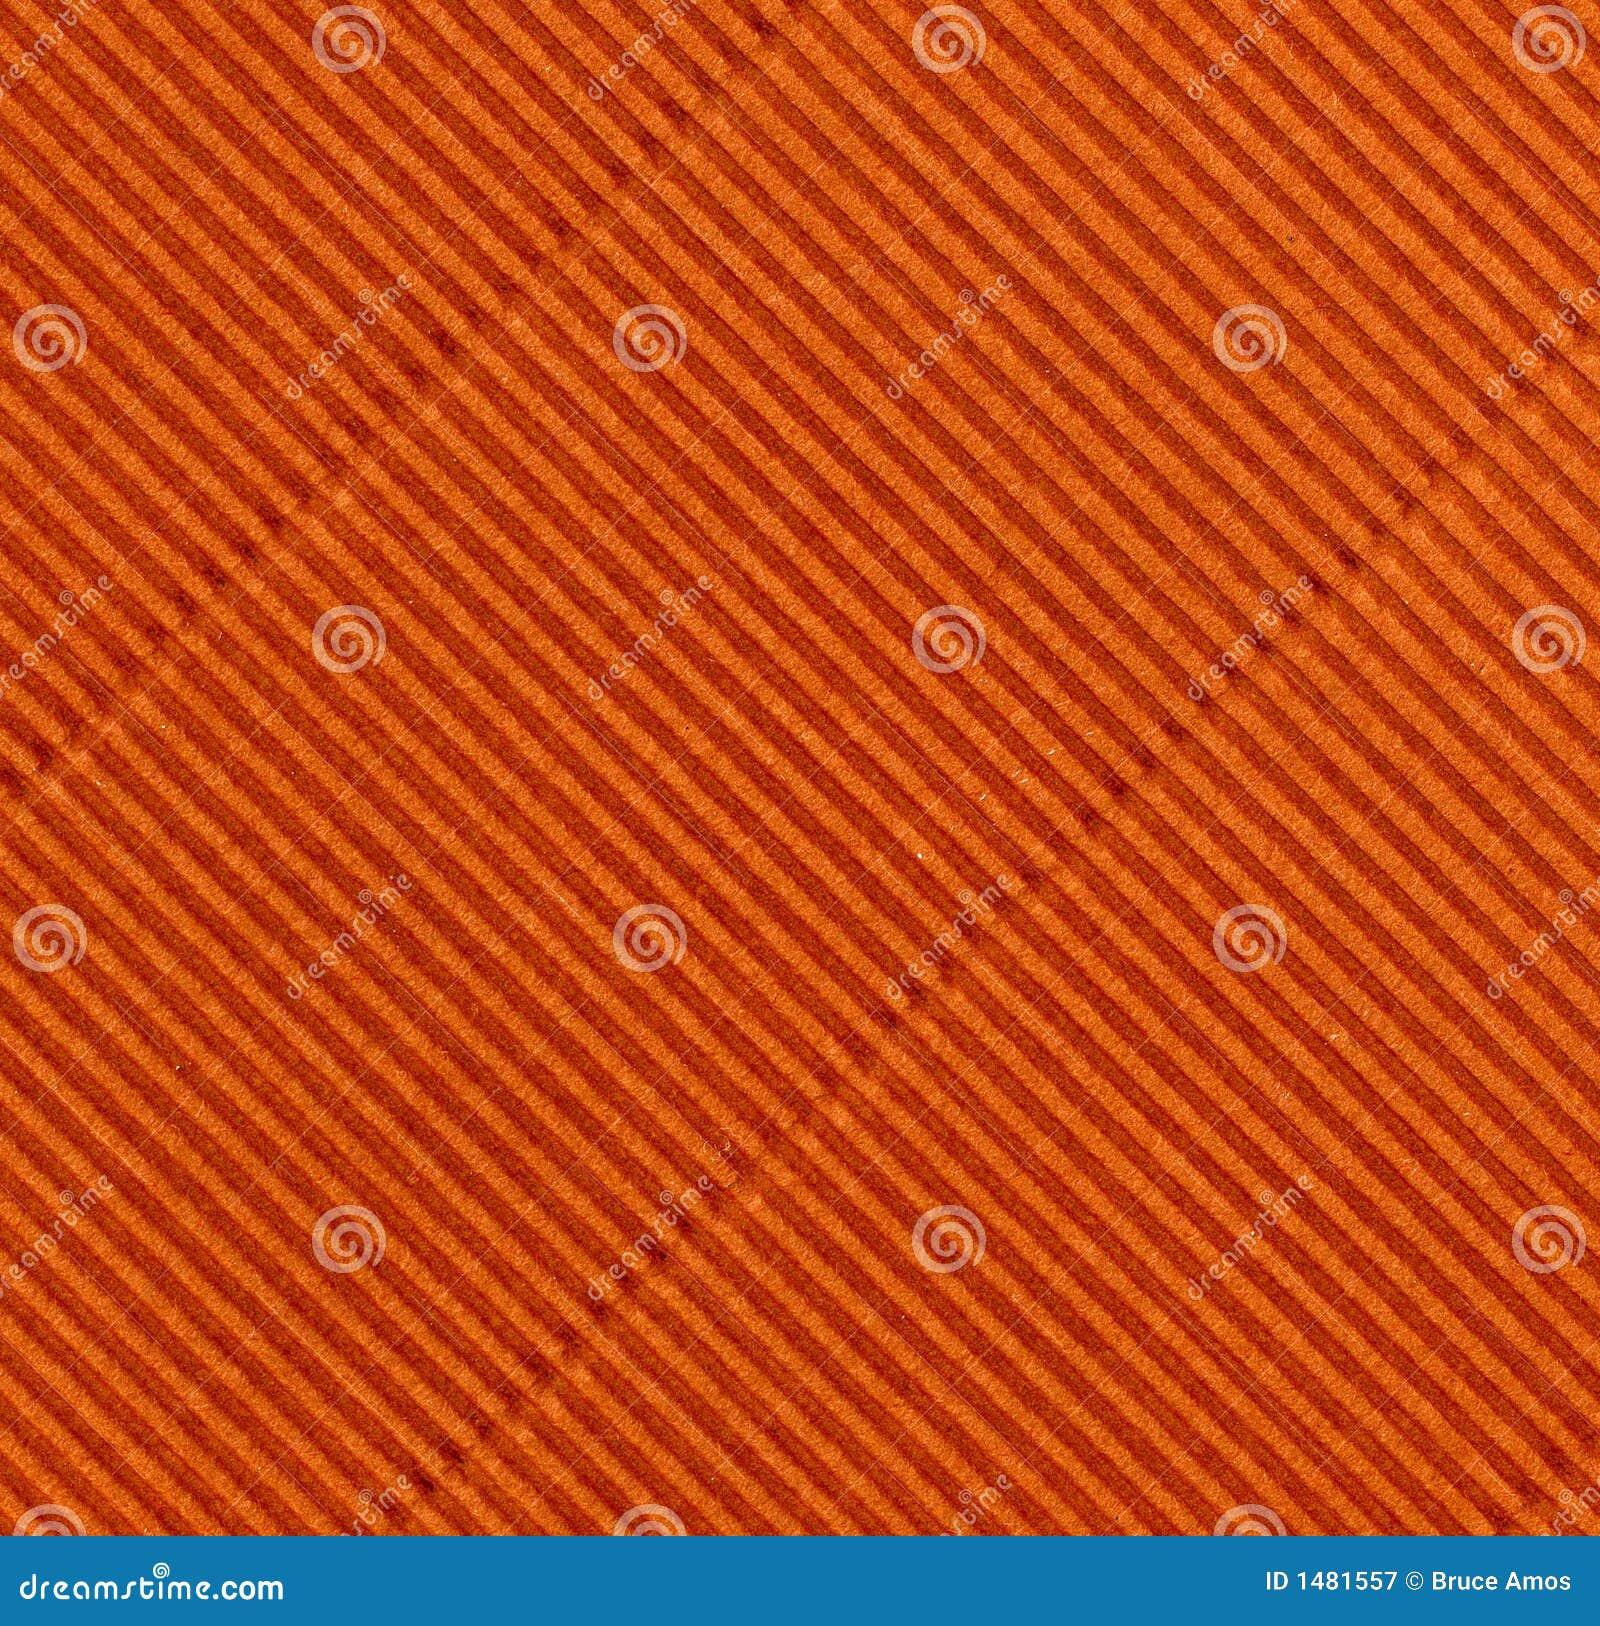 Rust-colored corrugations